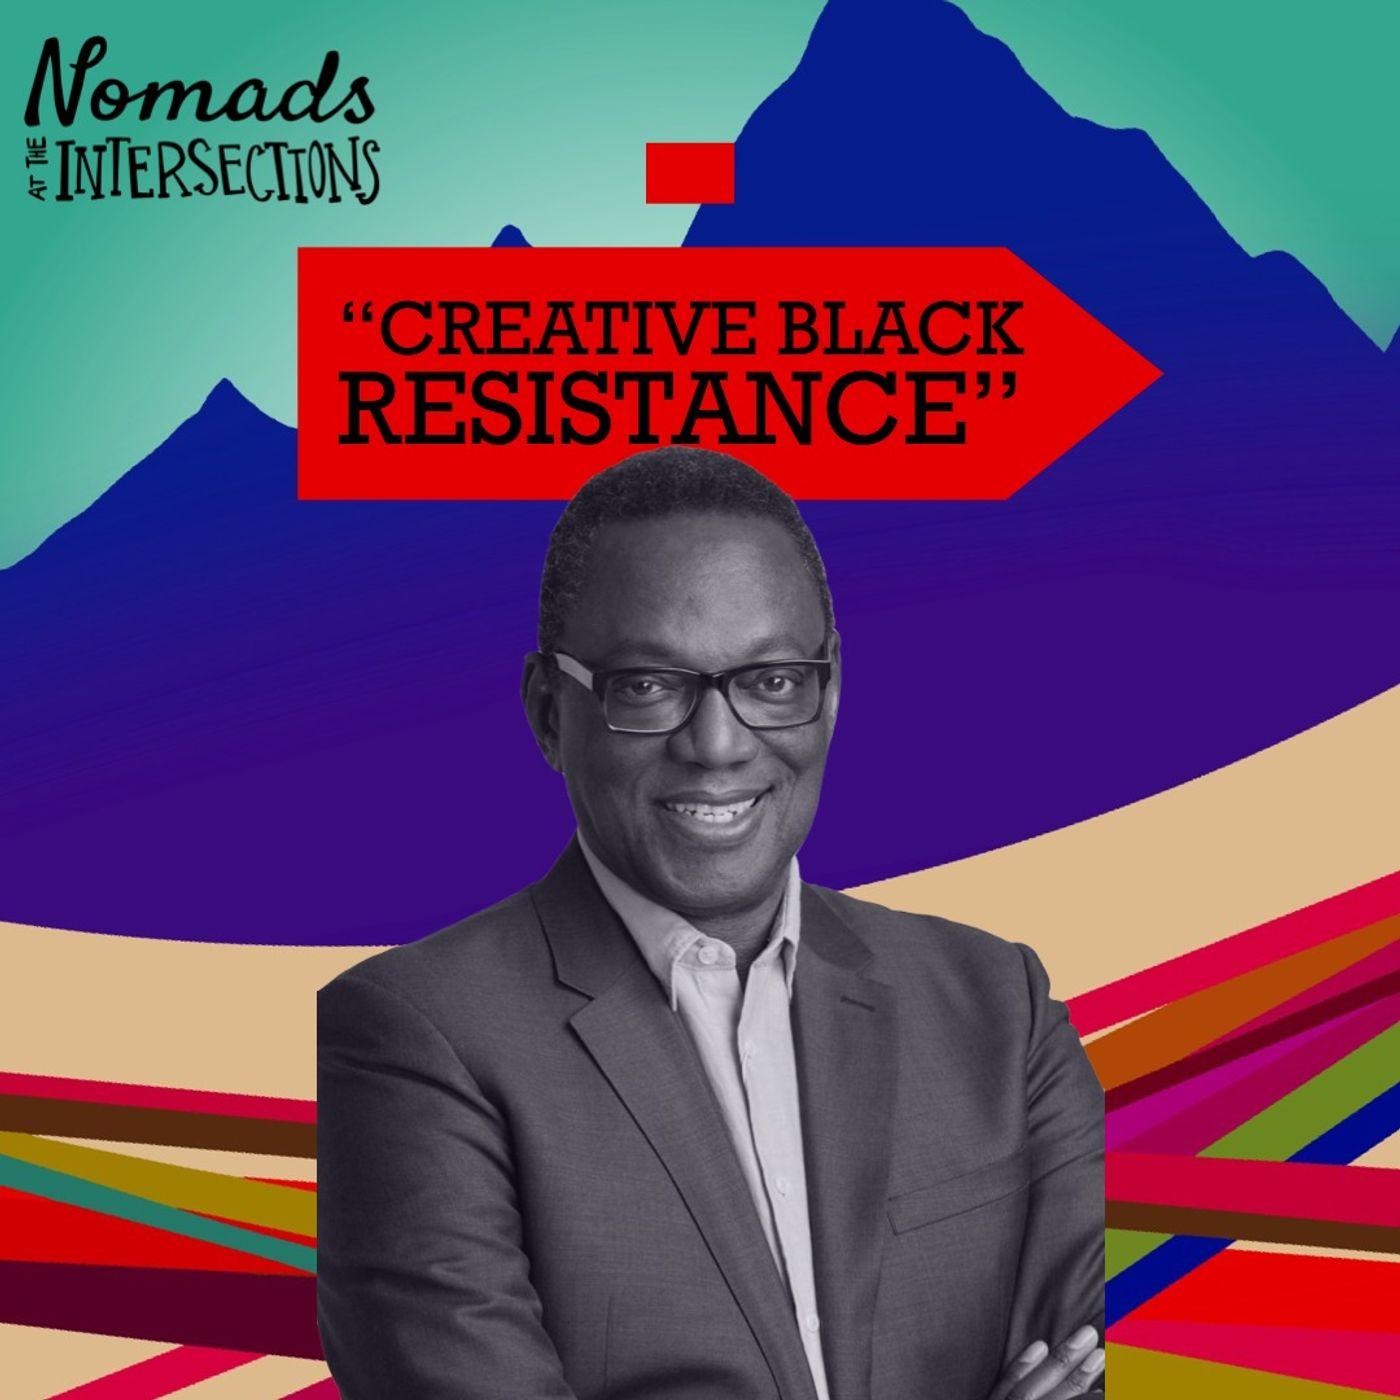 Creative Black Resistance